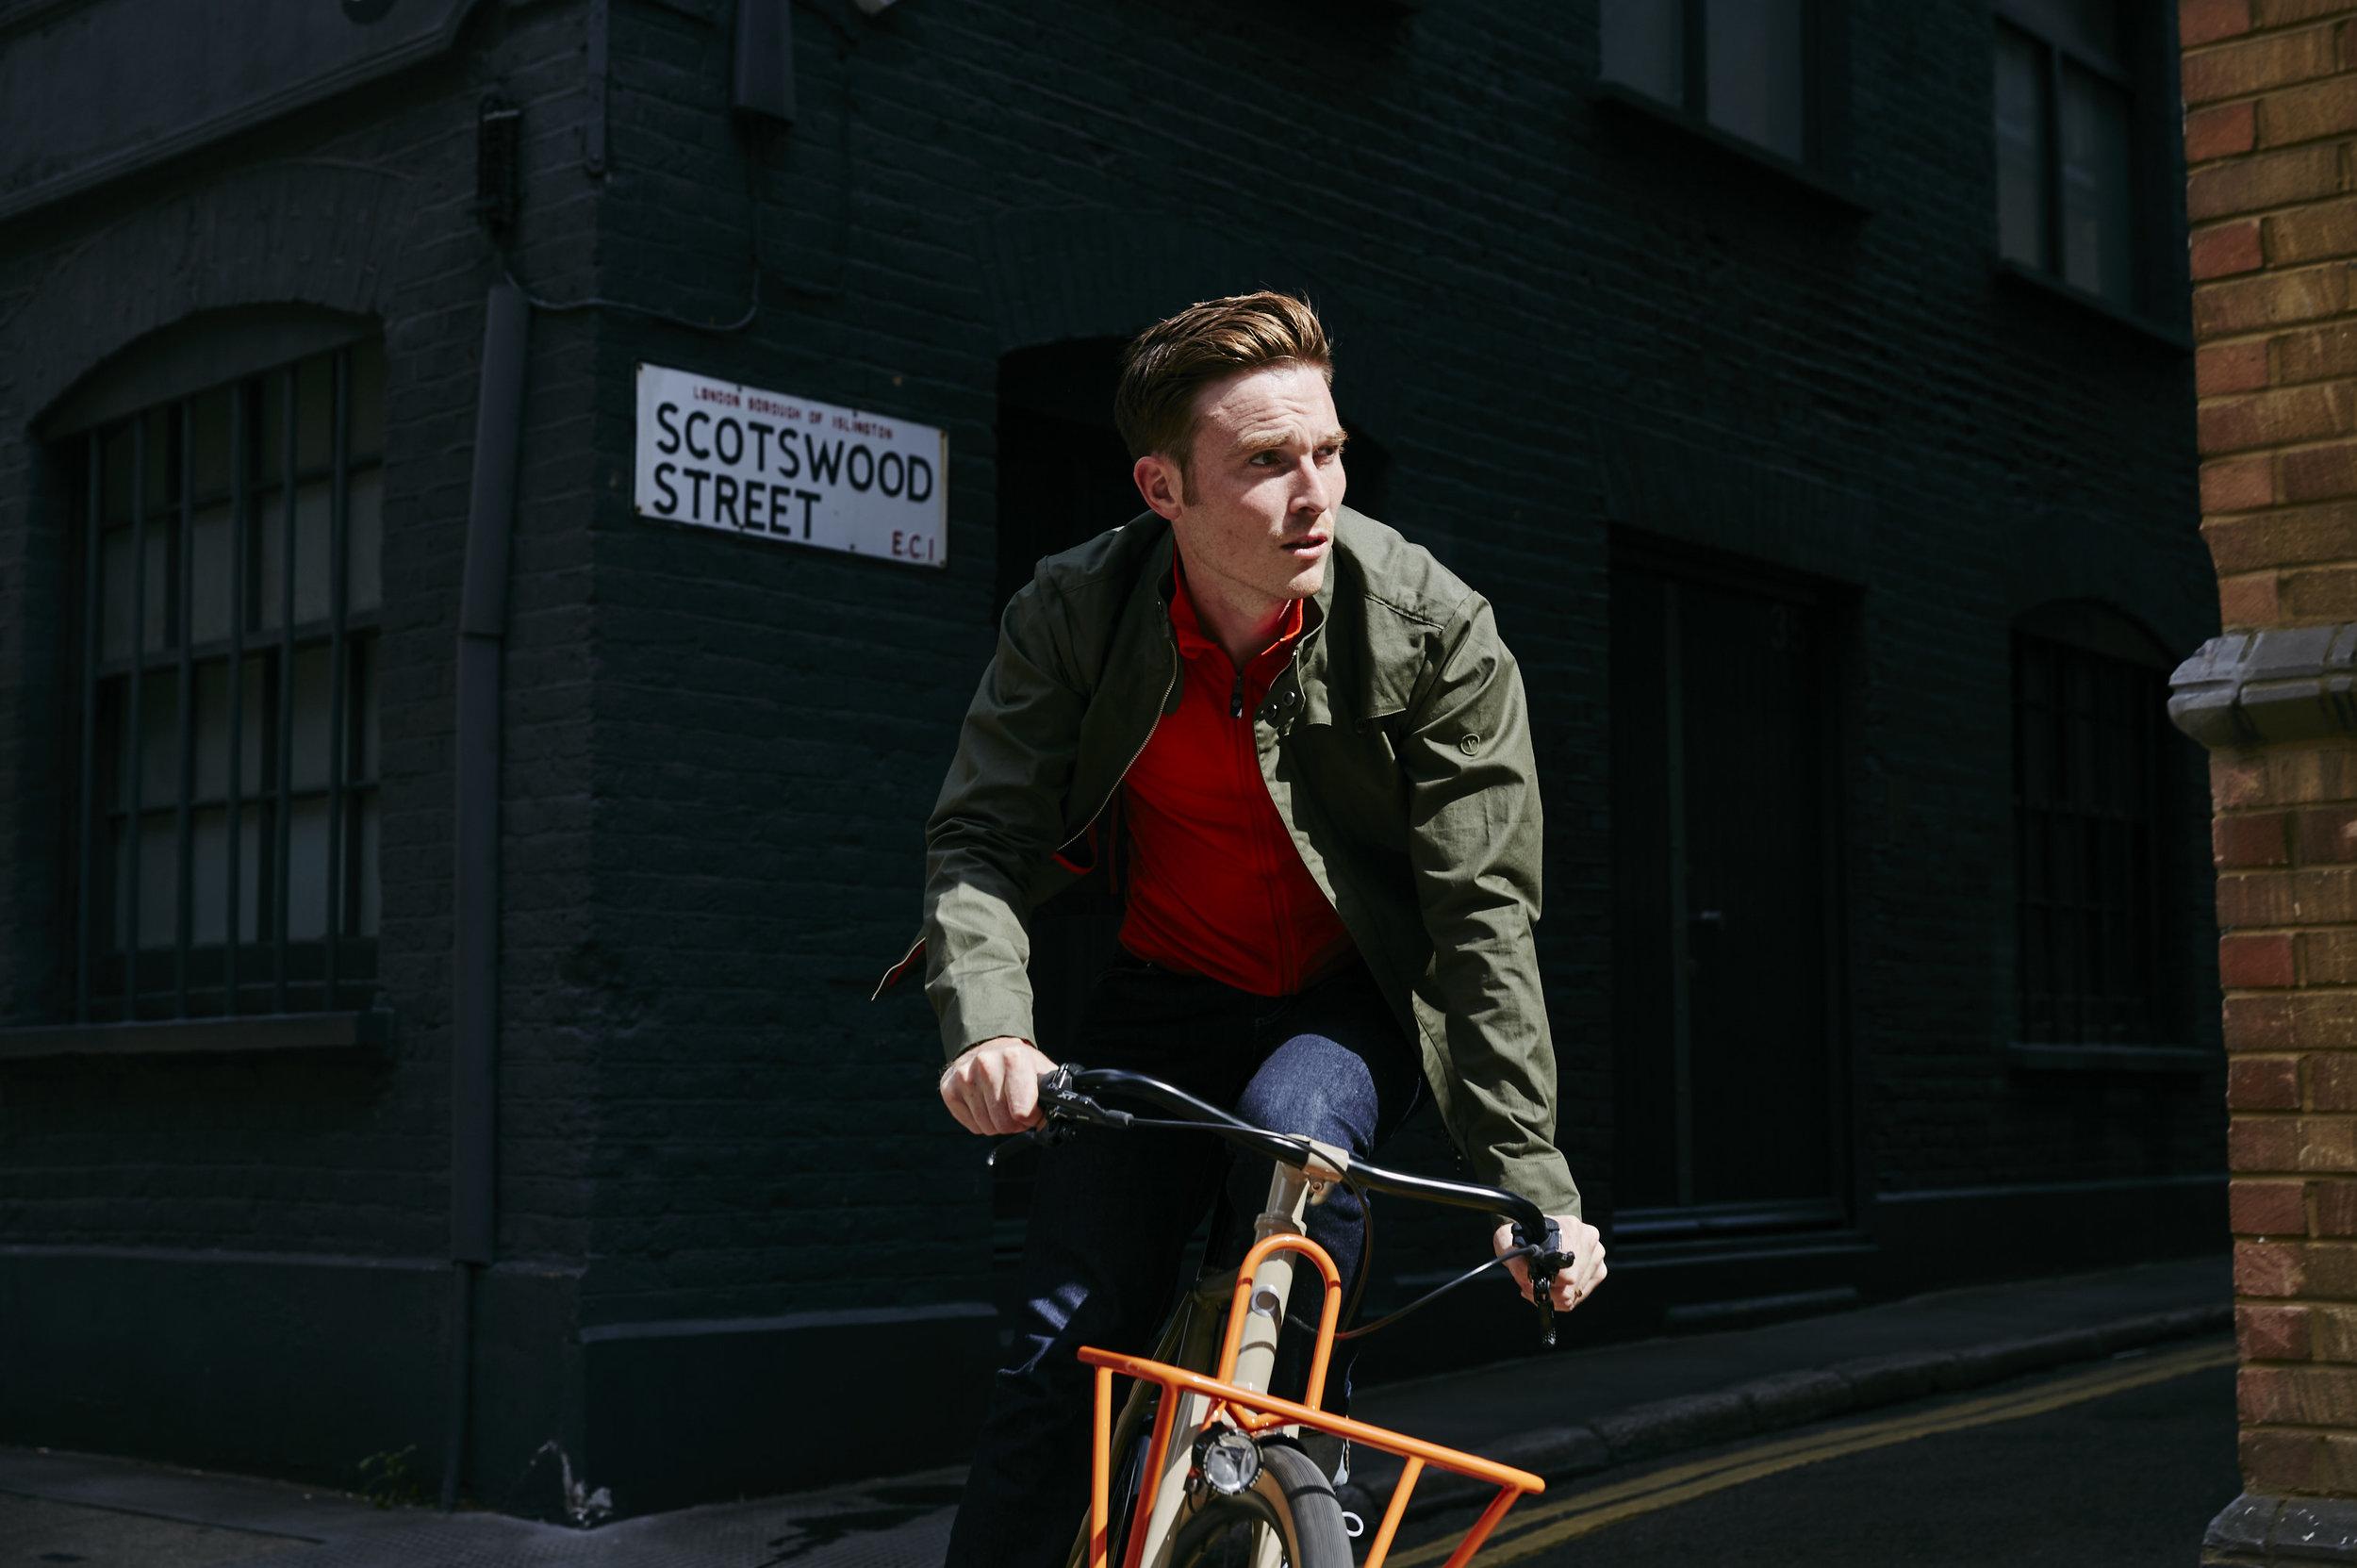 vulpine nick hussey city cycling style.jpg